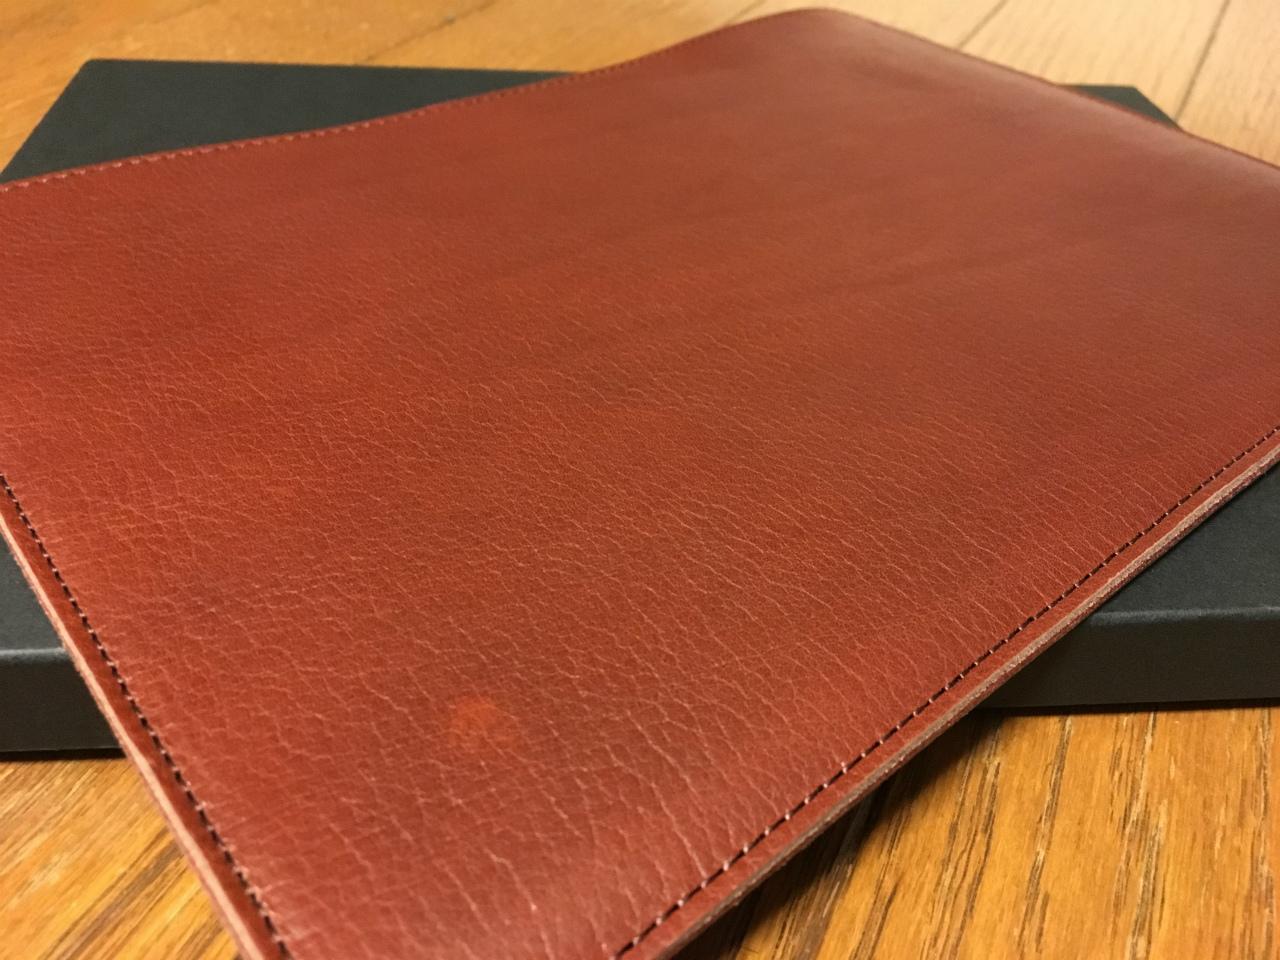 kunitachi-leather-sleeve-for-ipadpro-02